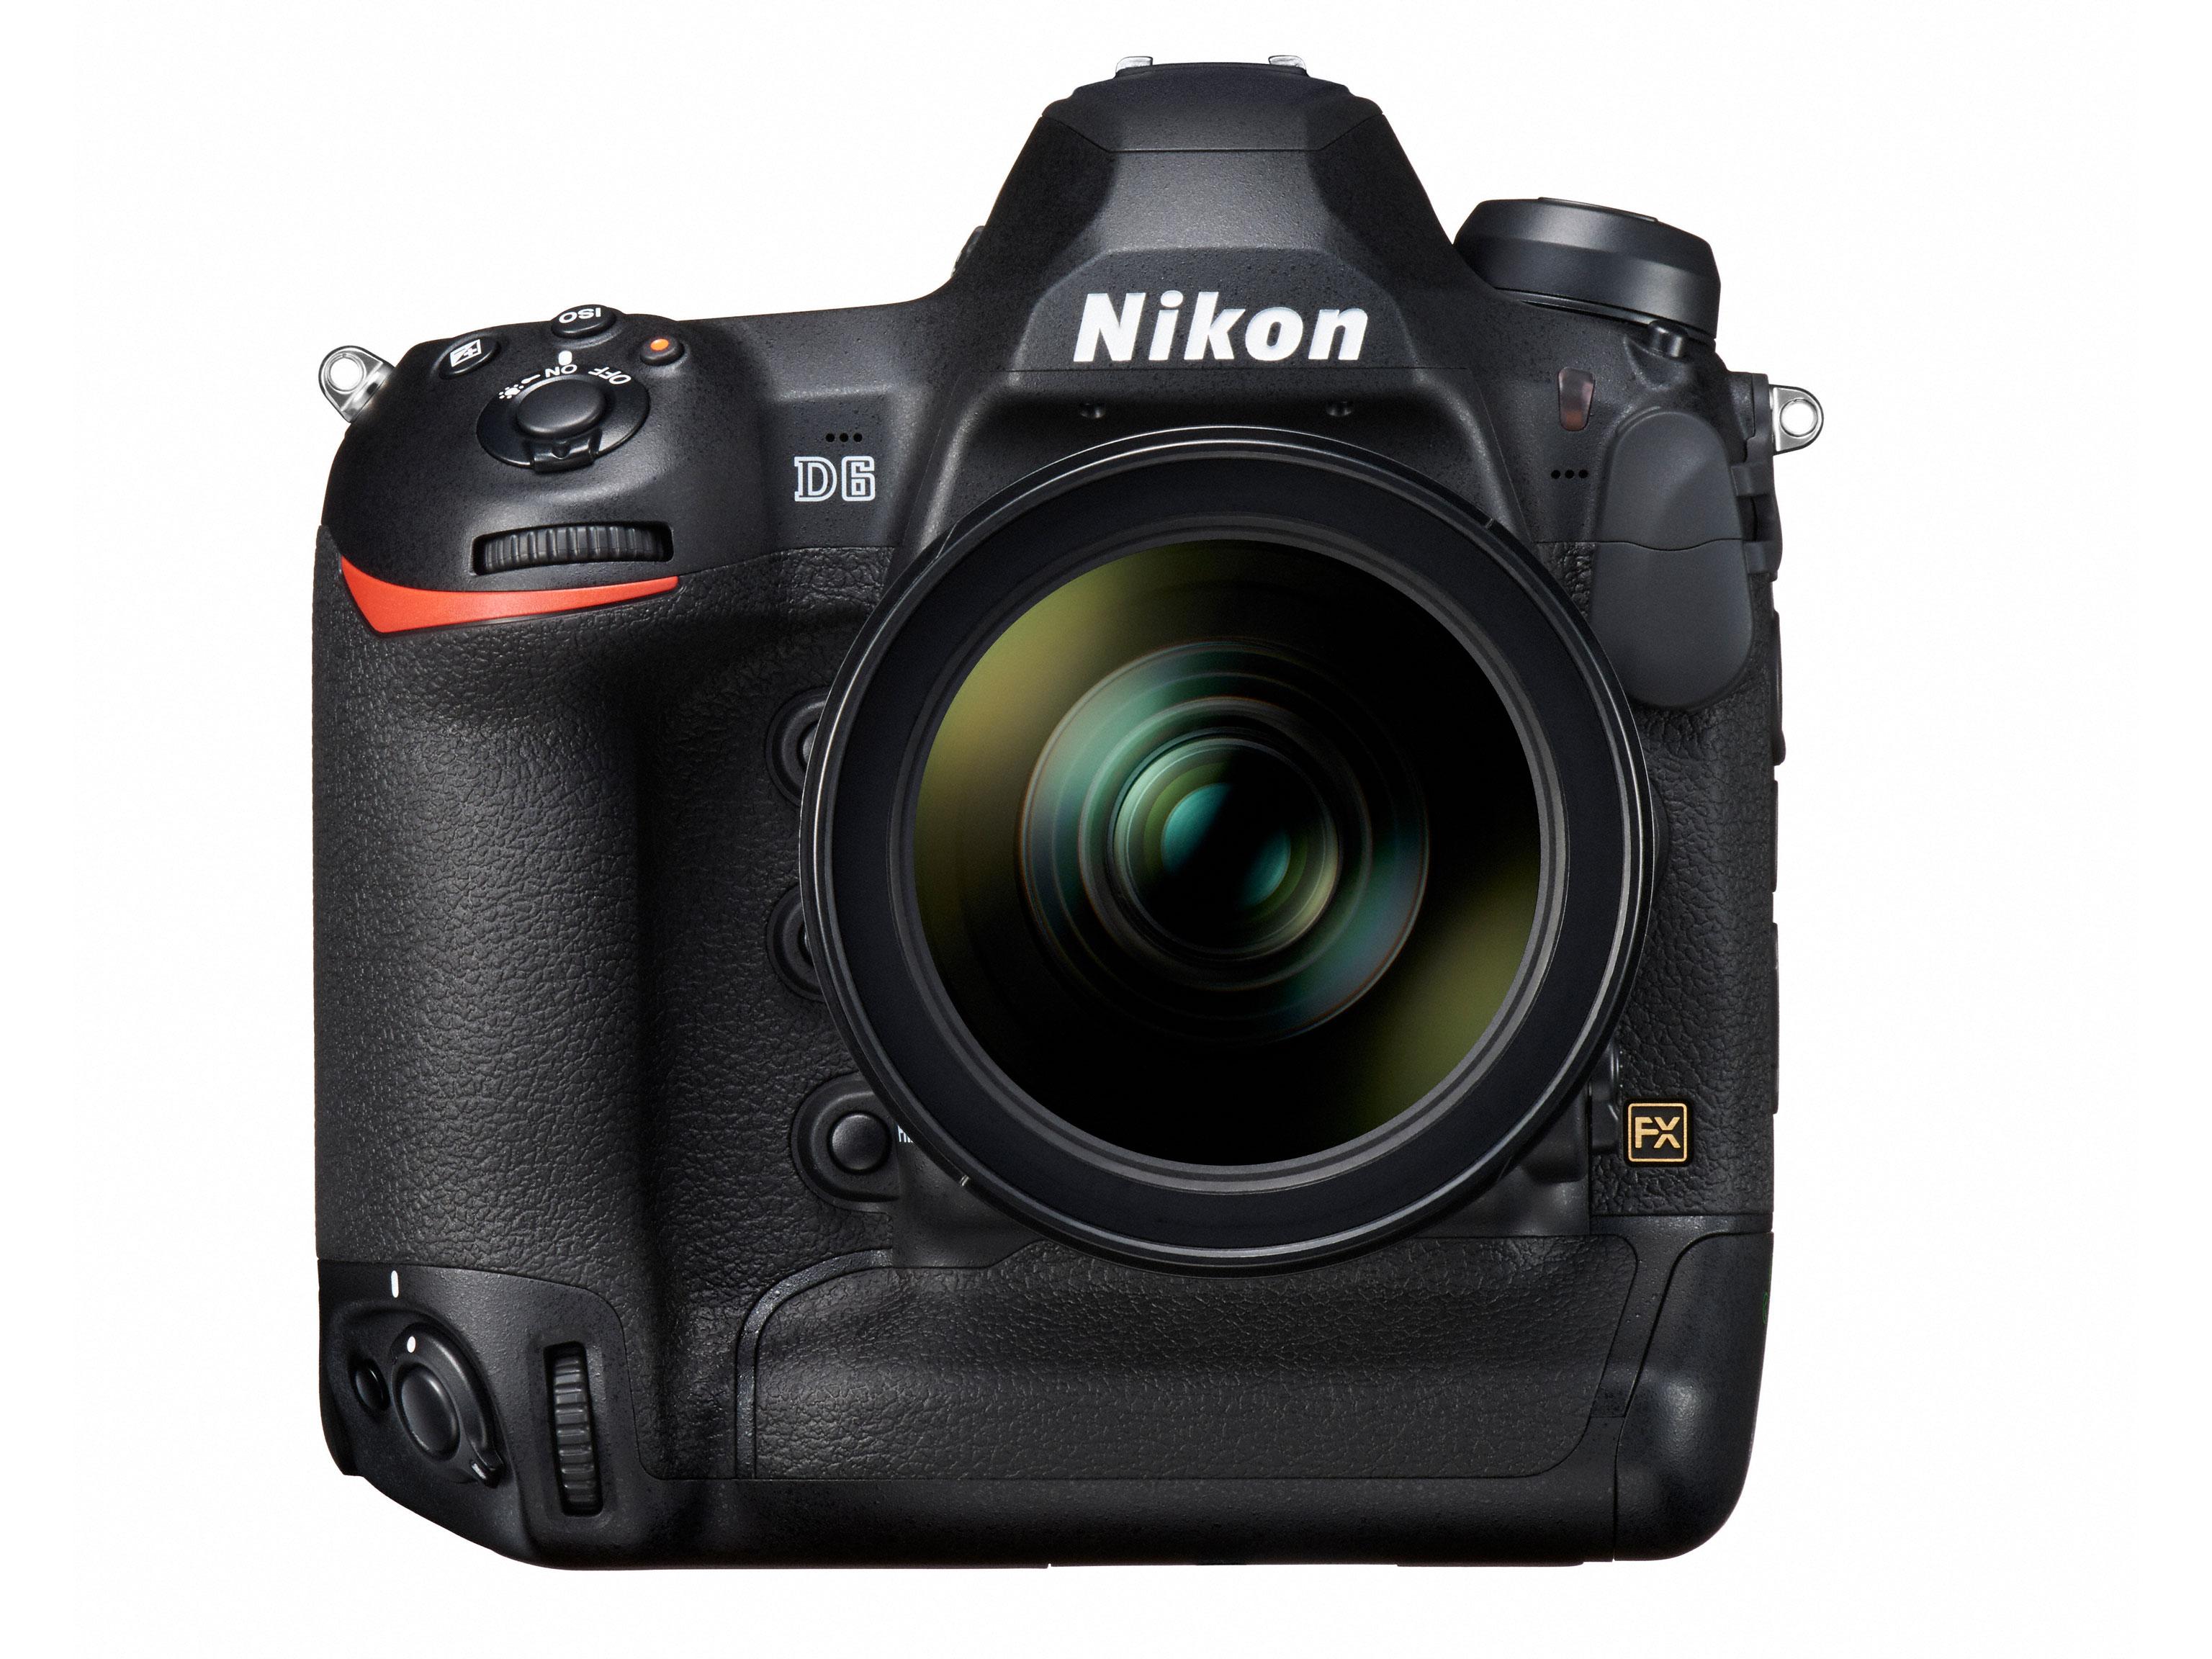 Nikon developing D6 professional DSLR: Digital Photography